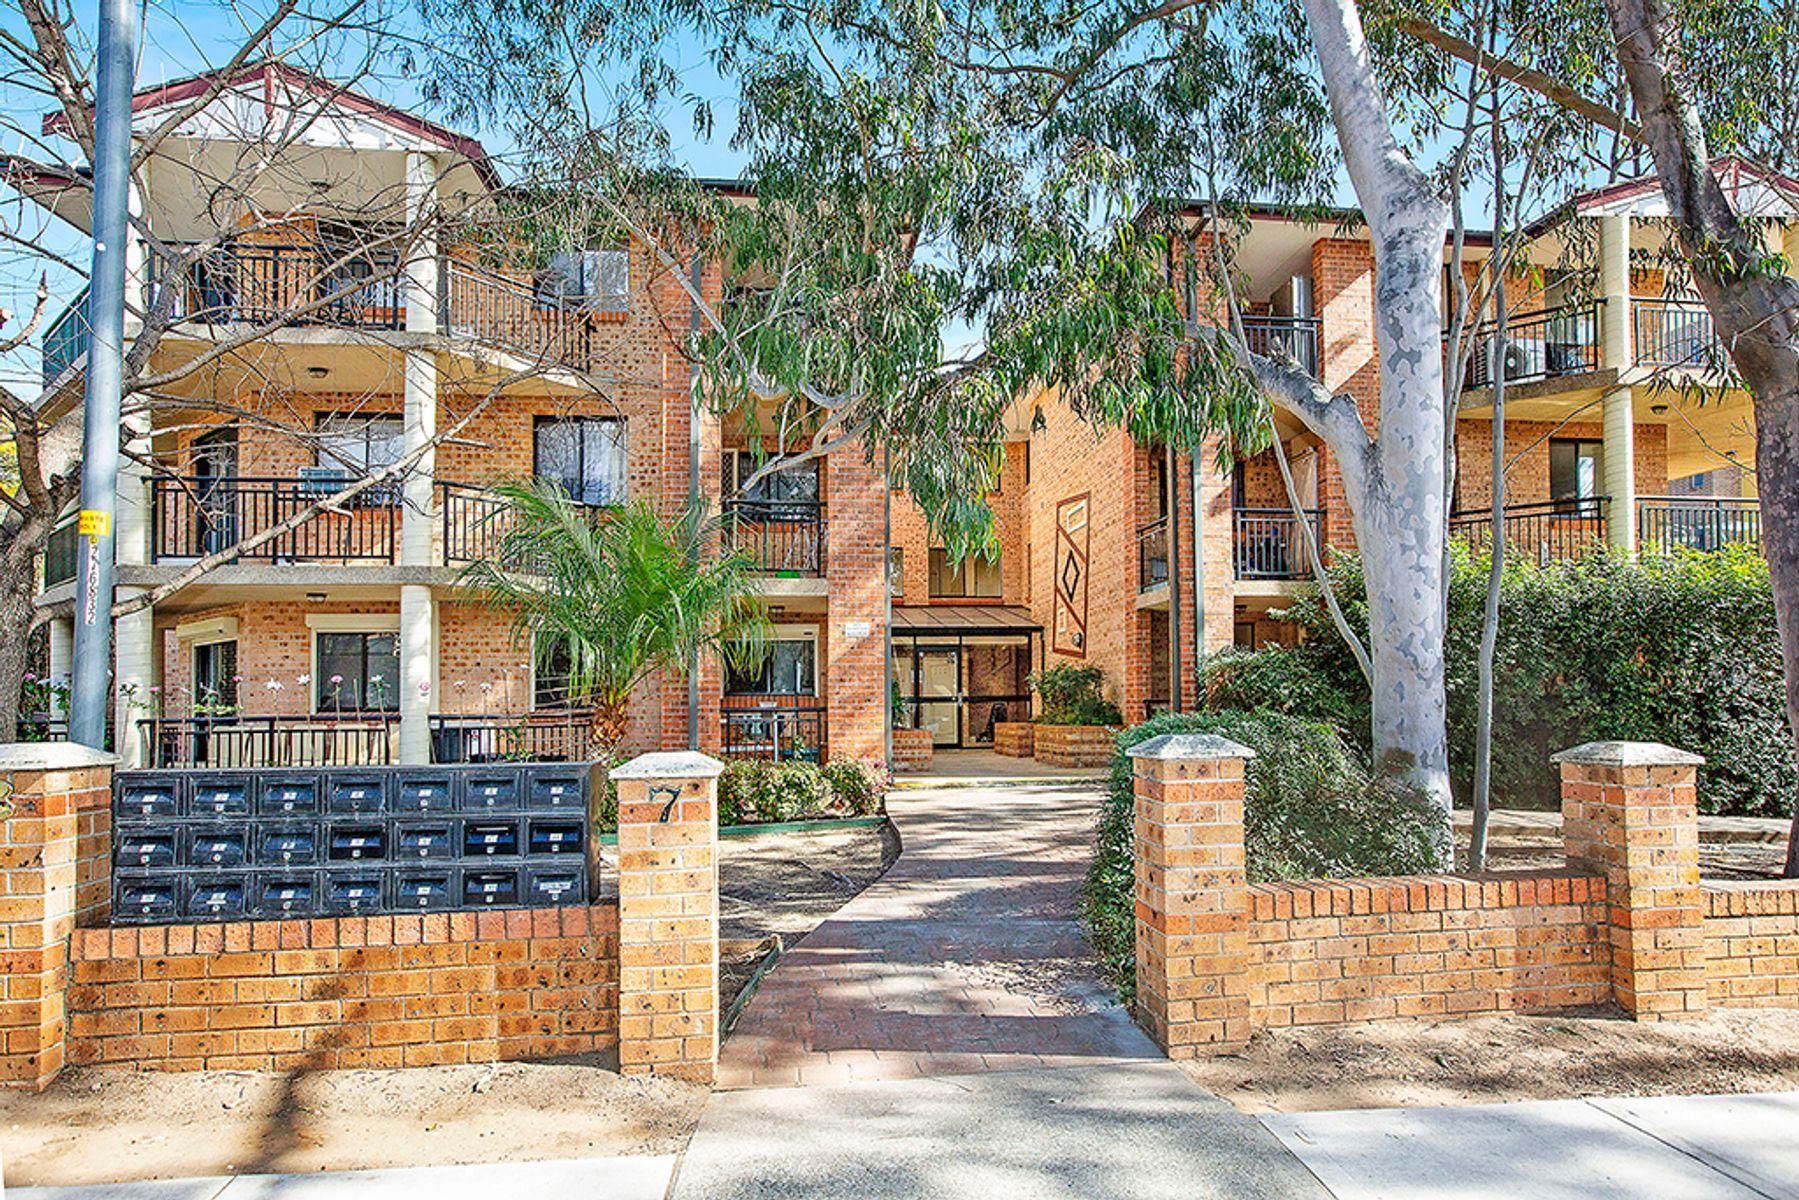 5/3-7 Addlestone Road, Merrylands, NSW 2160